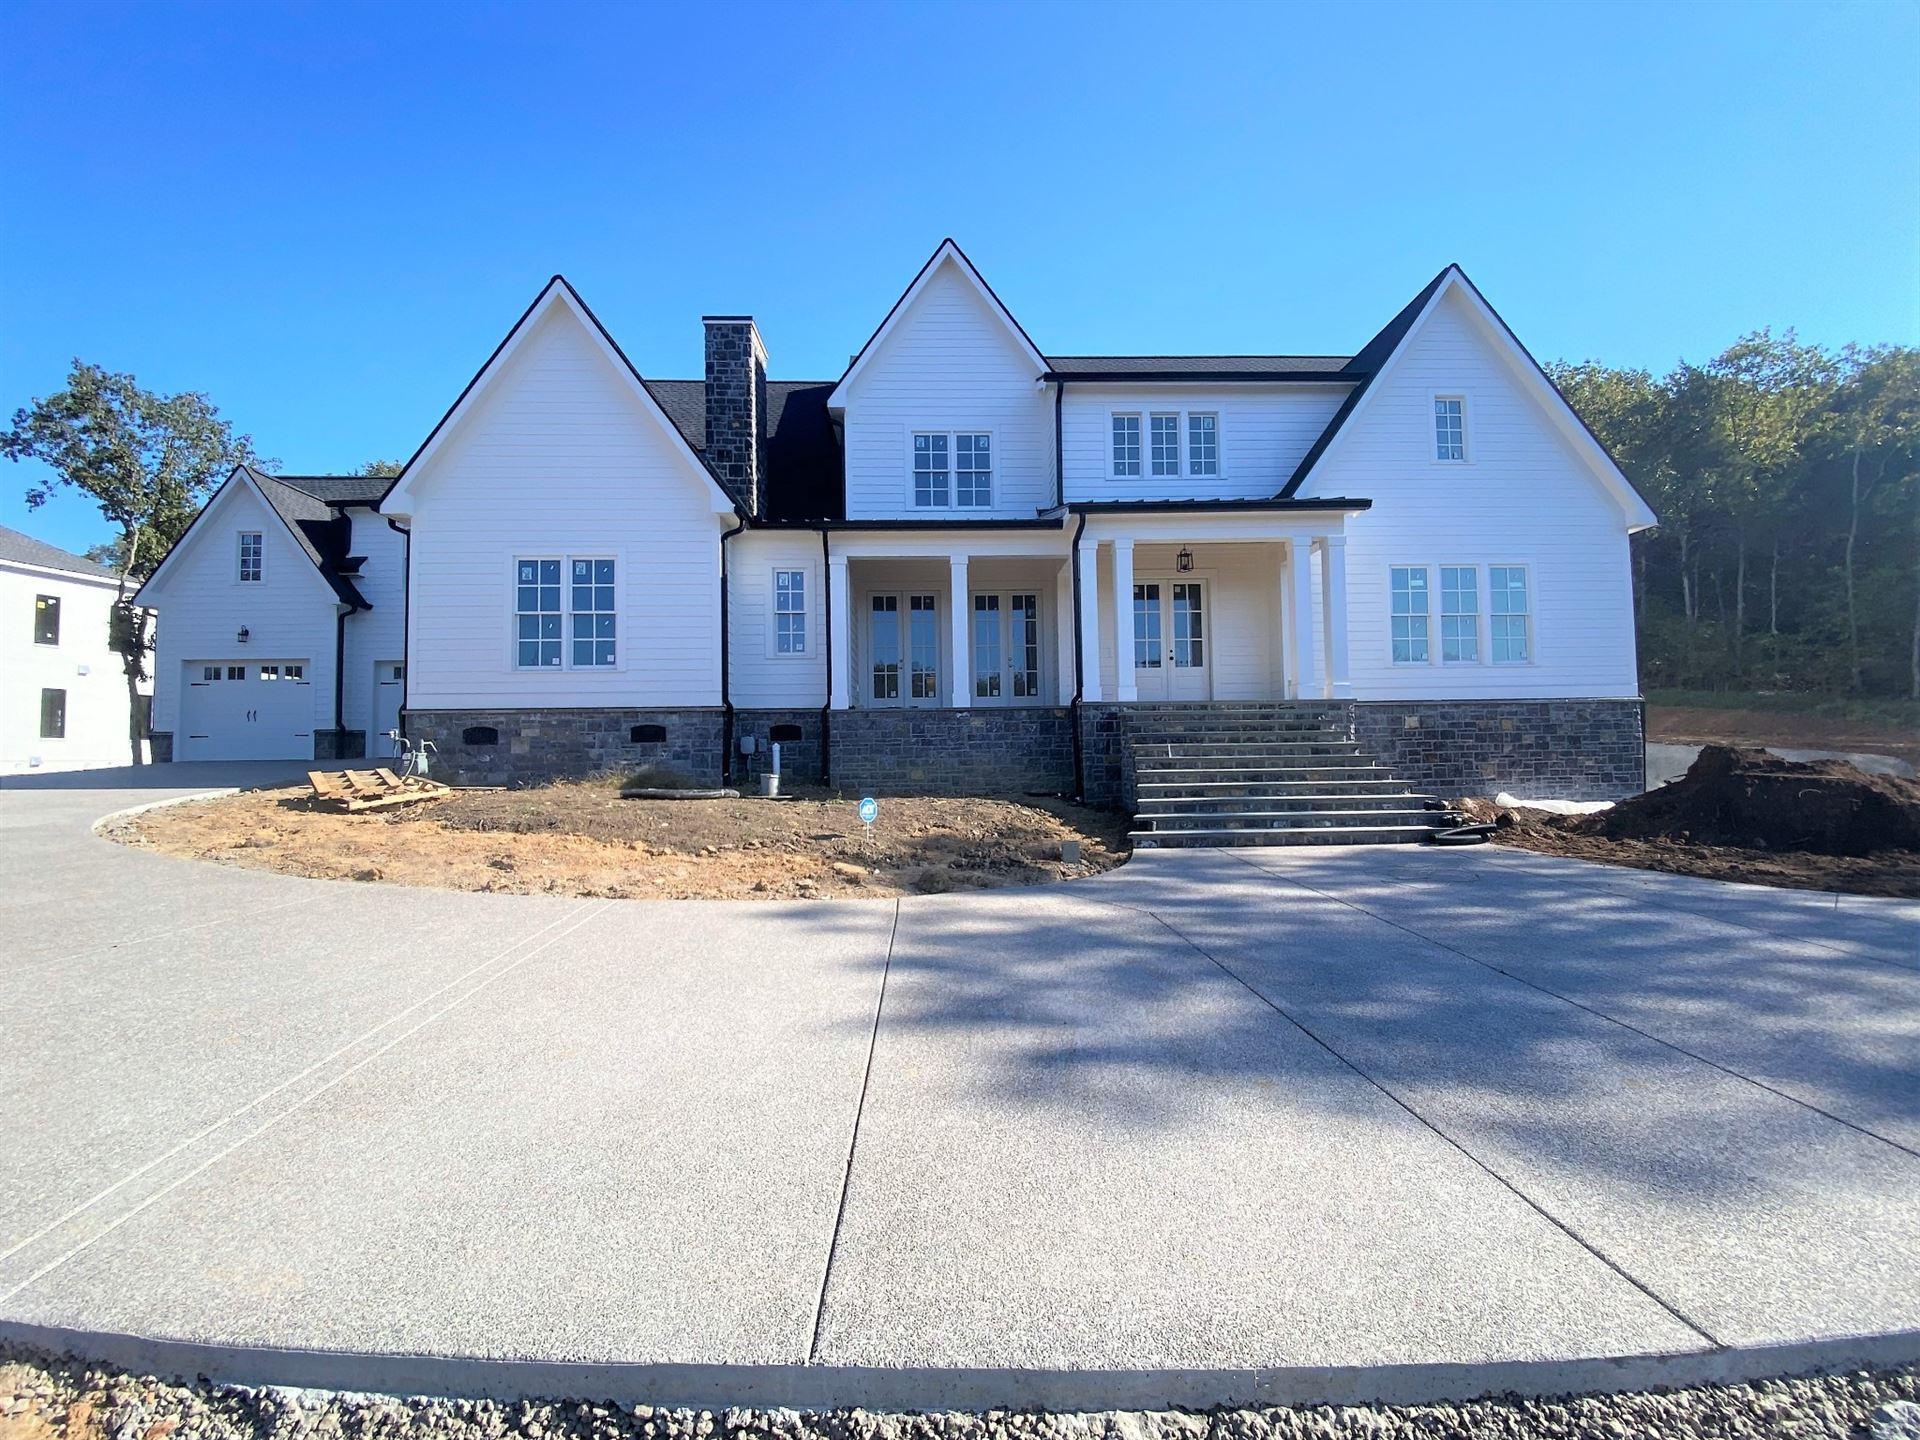 Photo of 456 Beech Creek Rd N, Brentwood, TN 37027 (MLS # 2226051)